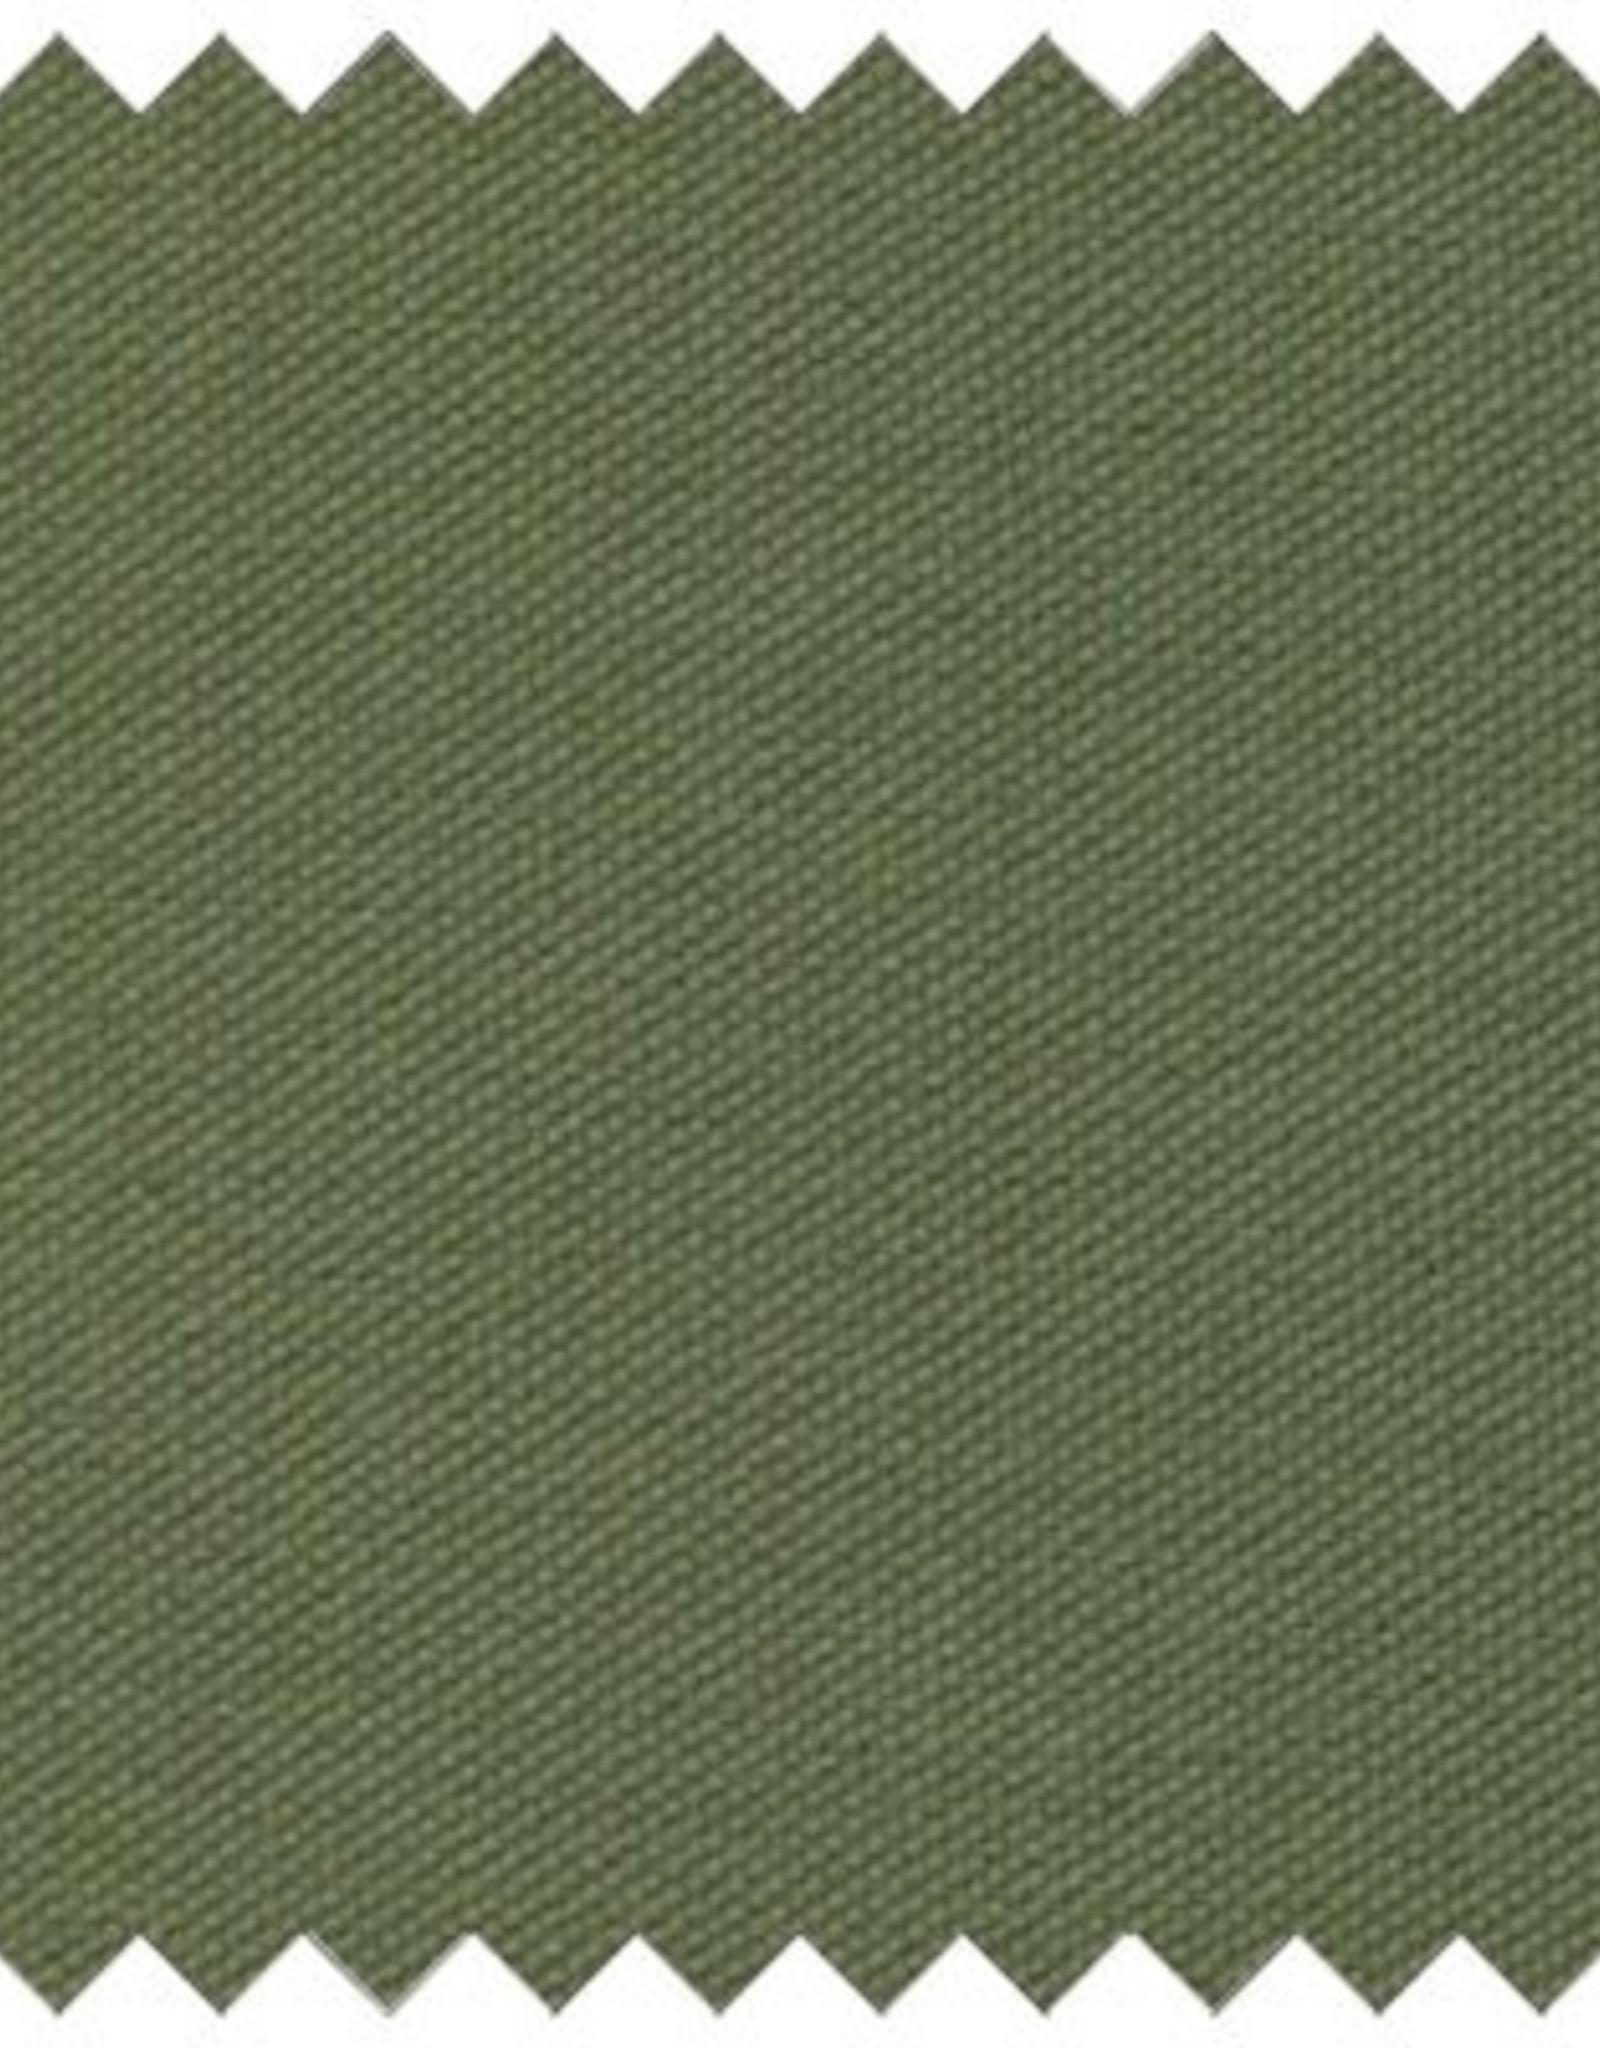 Carolina Morning Designs Buckwheat Yoga Block - Organic Moss